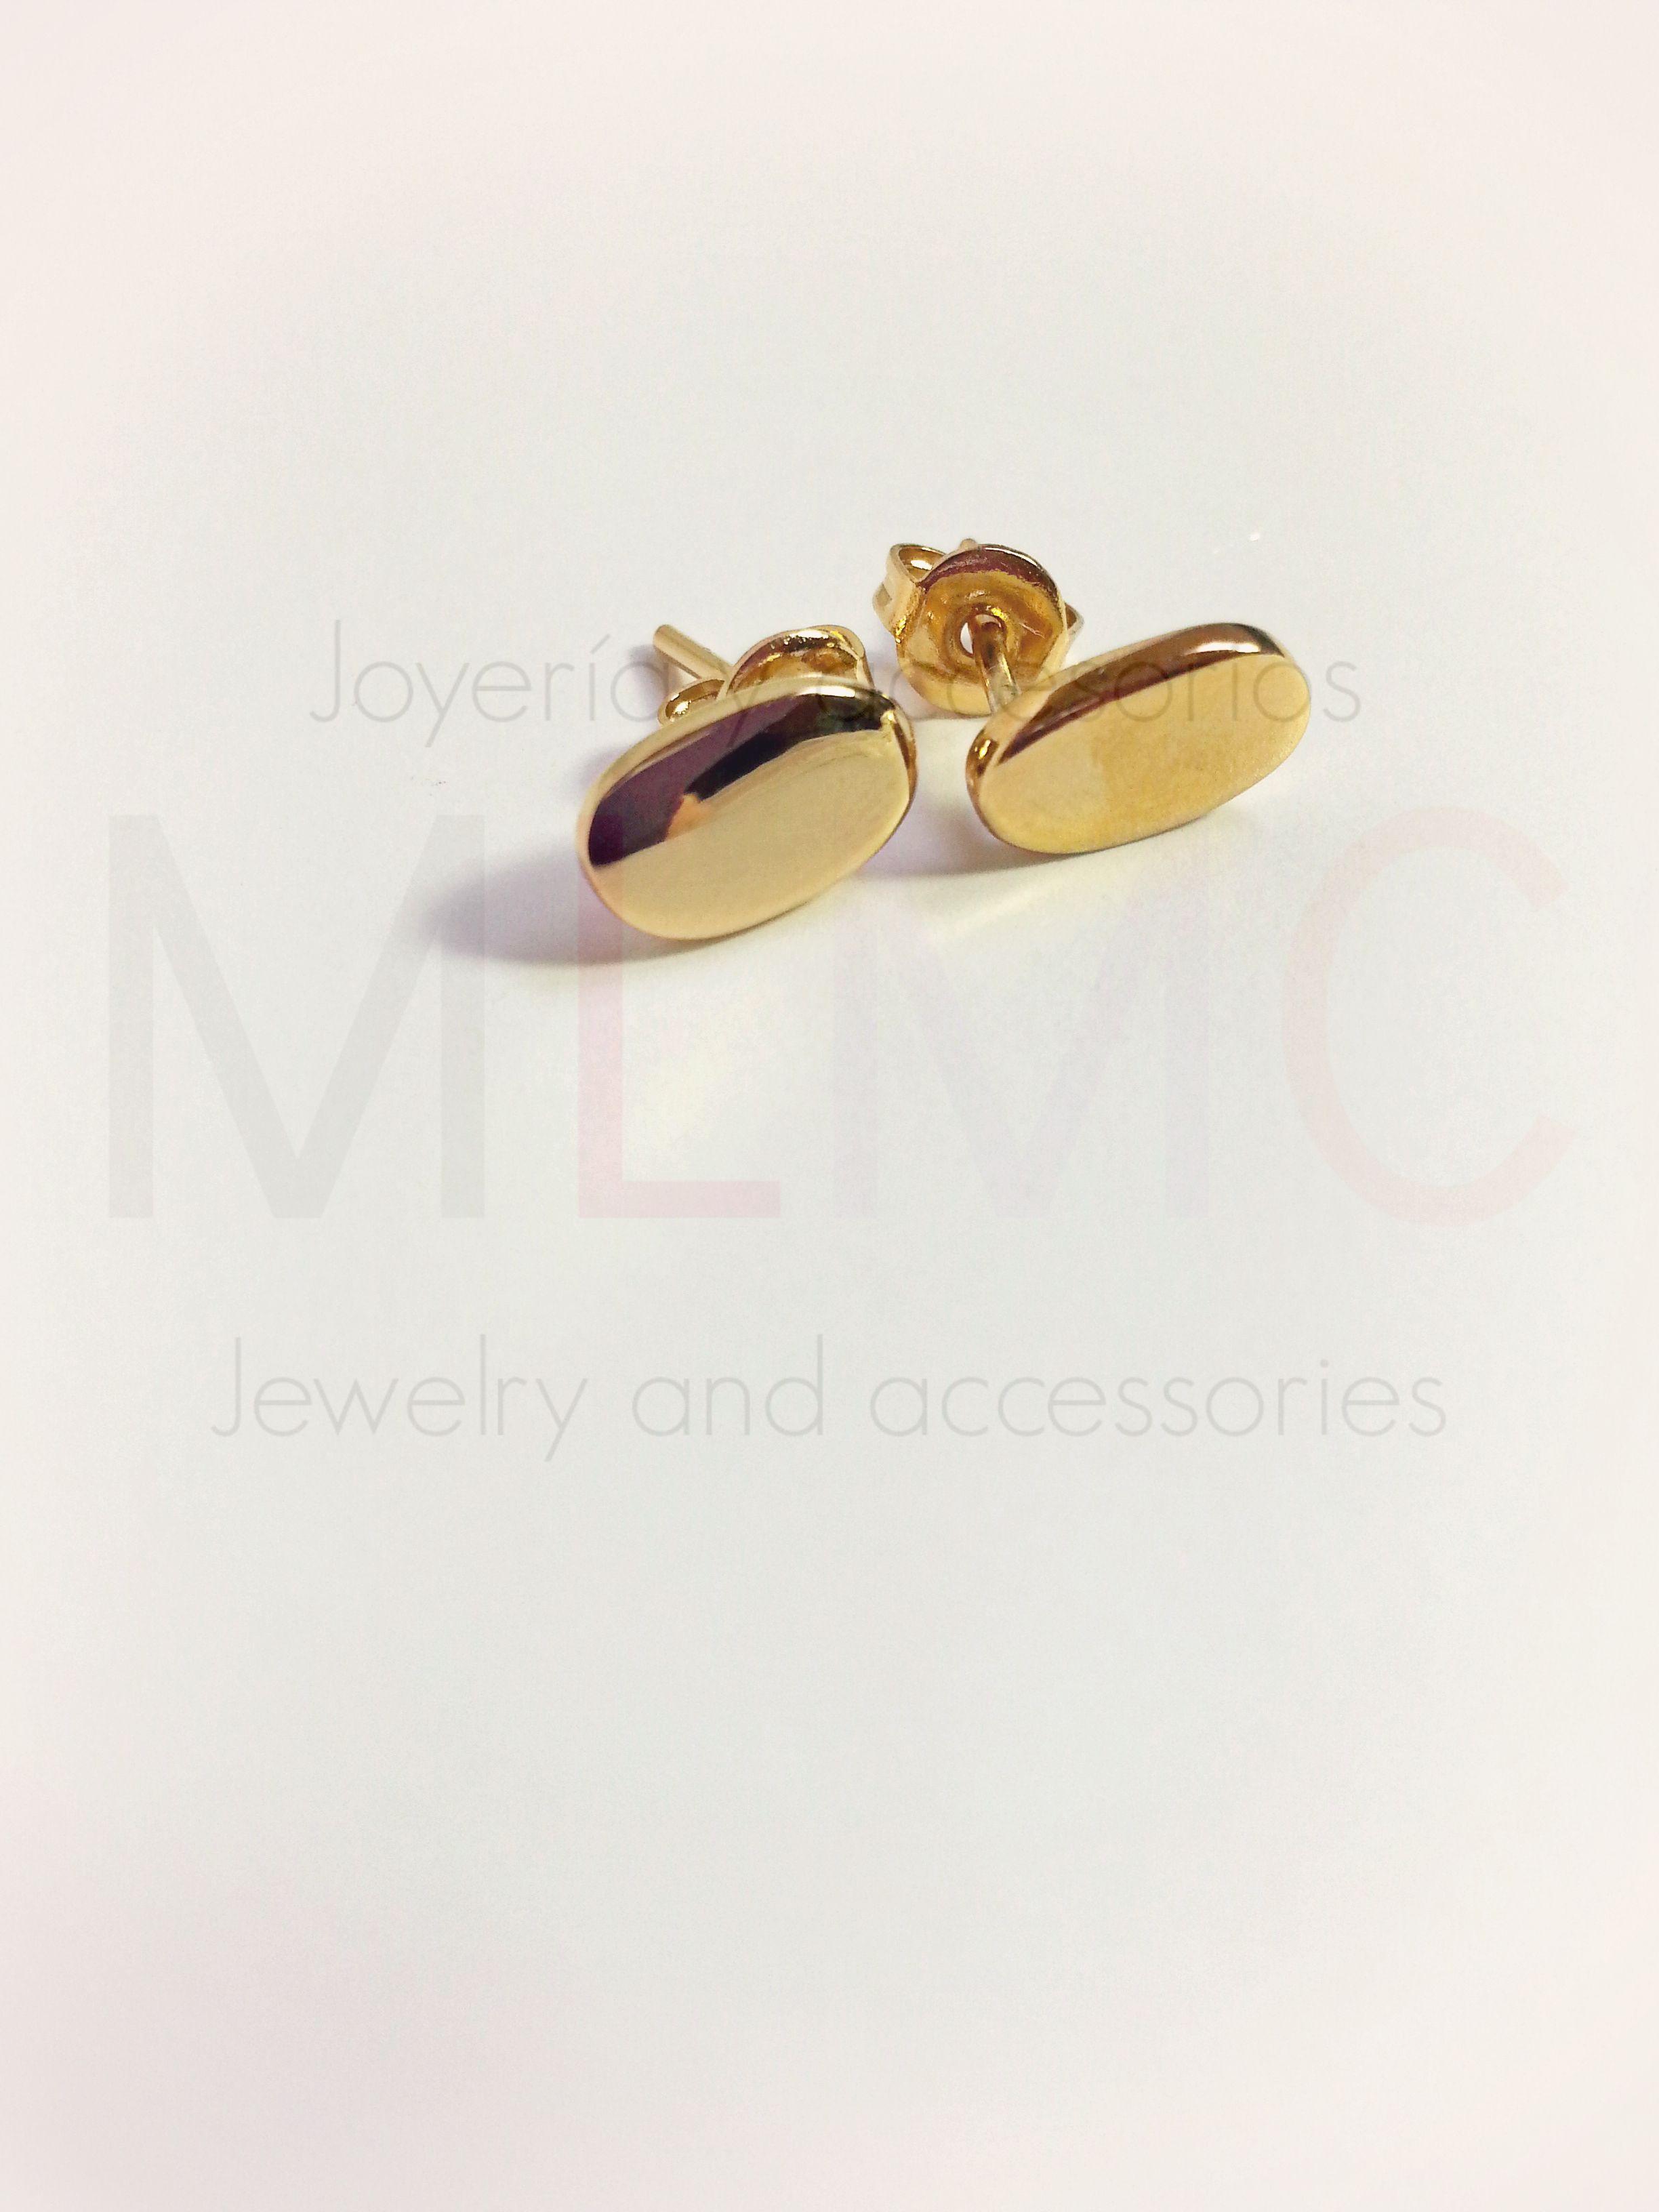 Compra aquí / Shop here: http://mlmcjewelry.tumblr.com/comprabuy  #earrings #golden #metalalloy #mexican #jewelry #jewels #accessories #shoponline